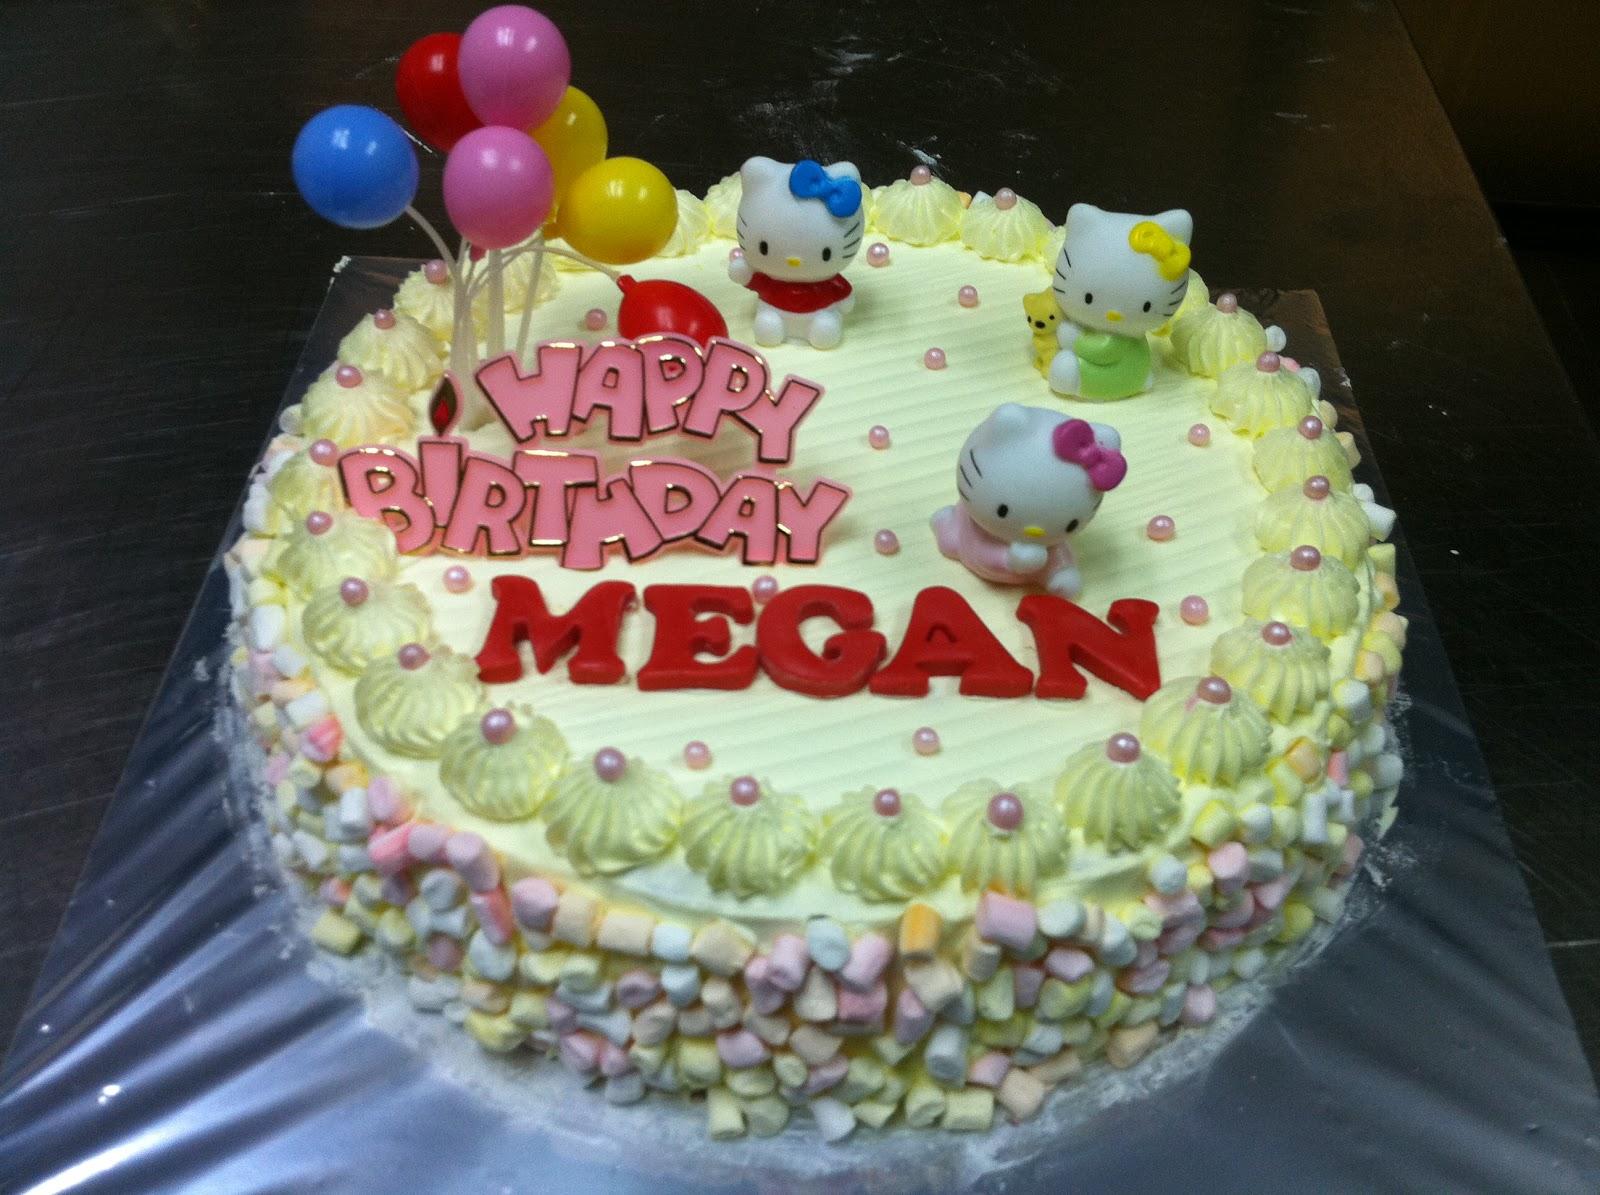 Haven Bakery Megan Hello Kitty Birthday Cake